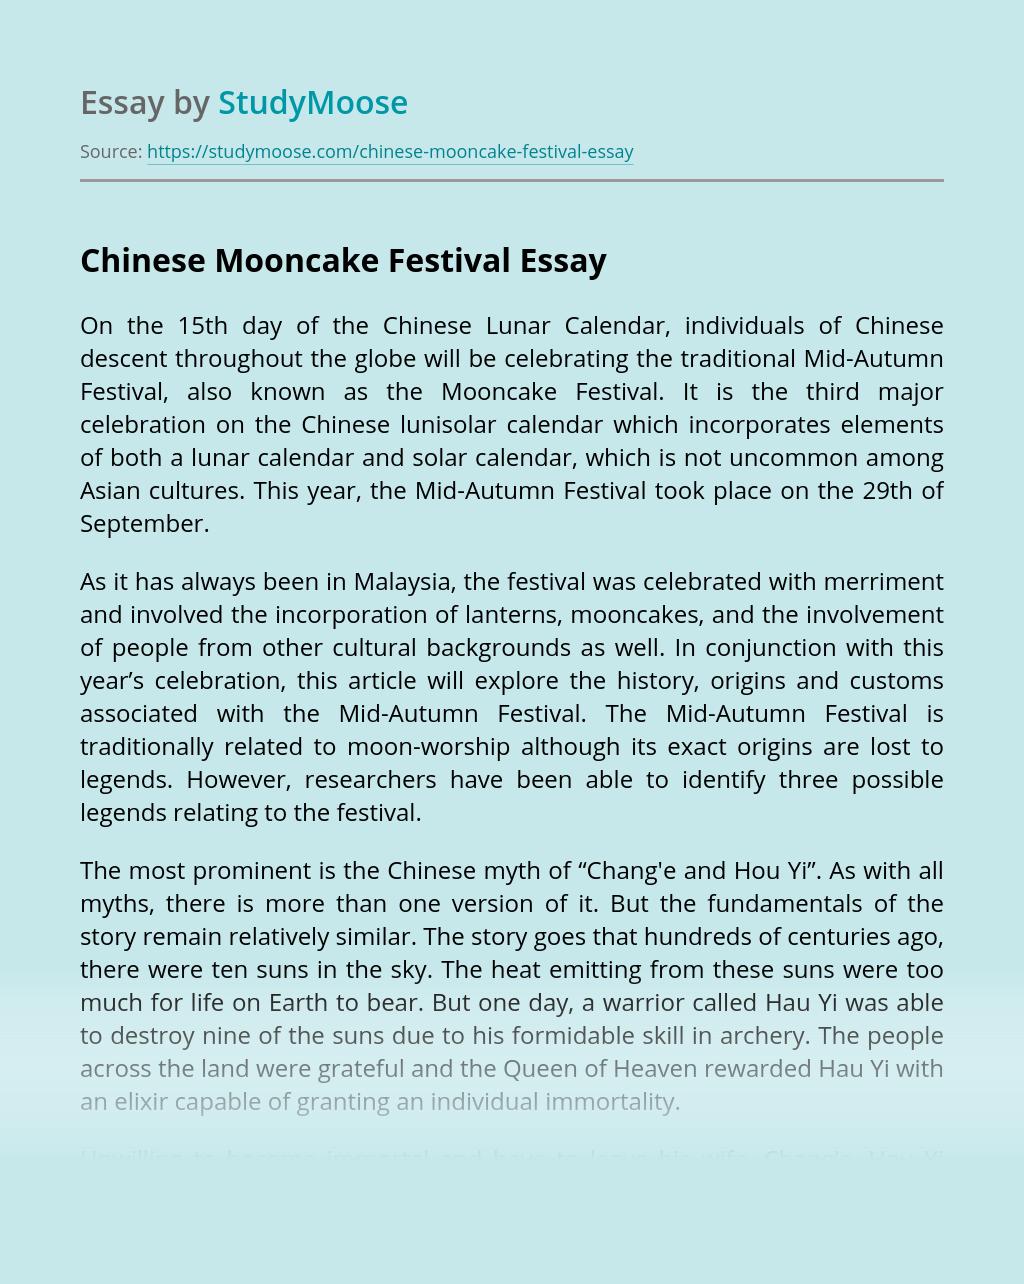 Chinese Mooncake Festival